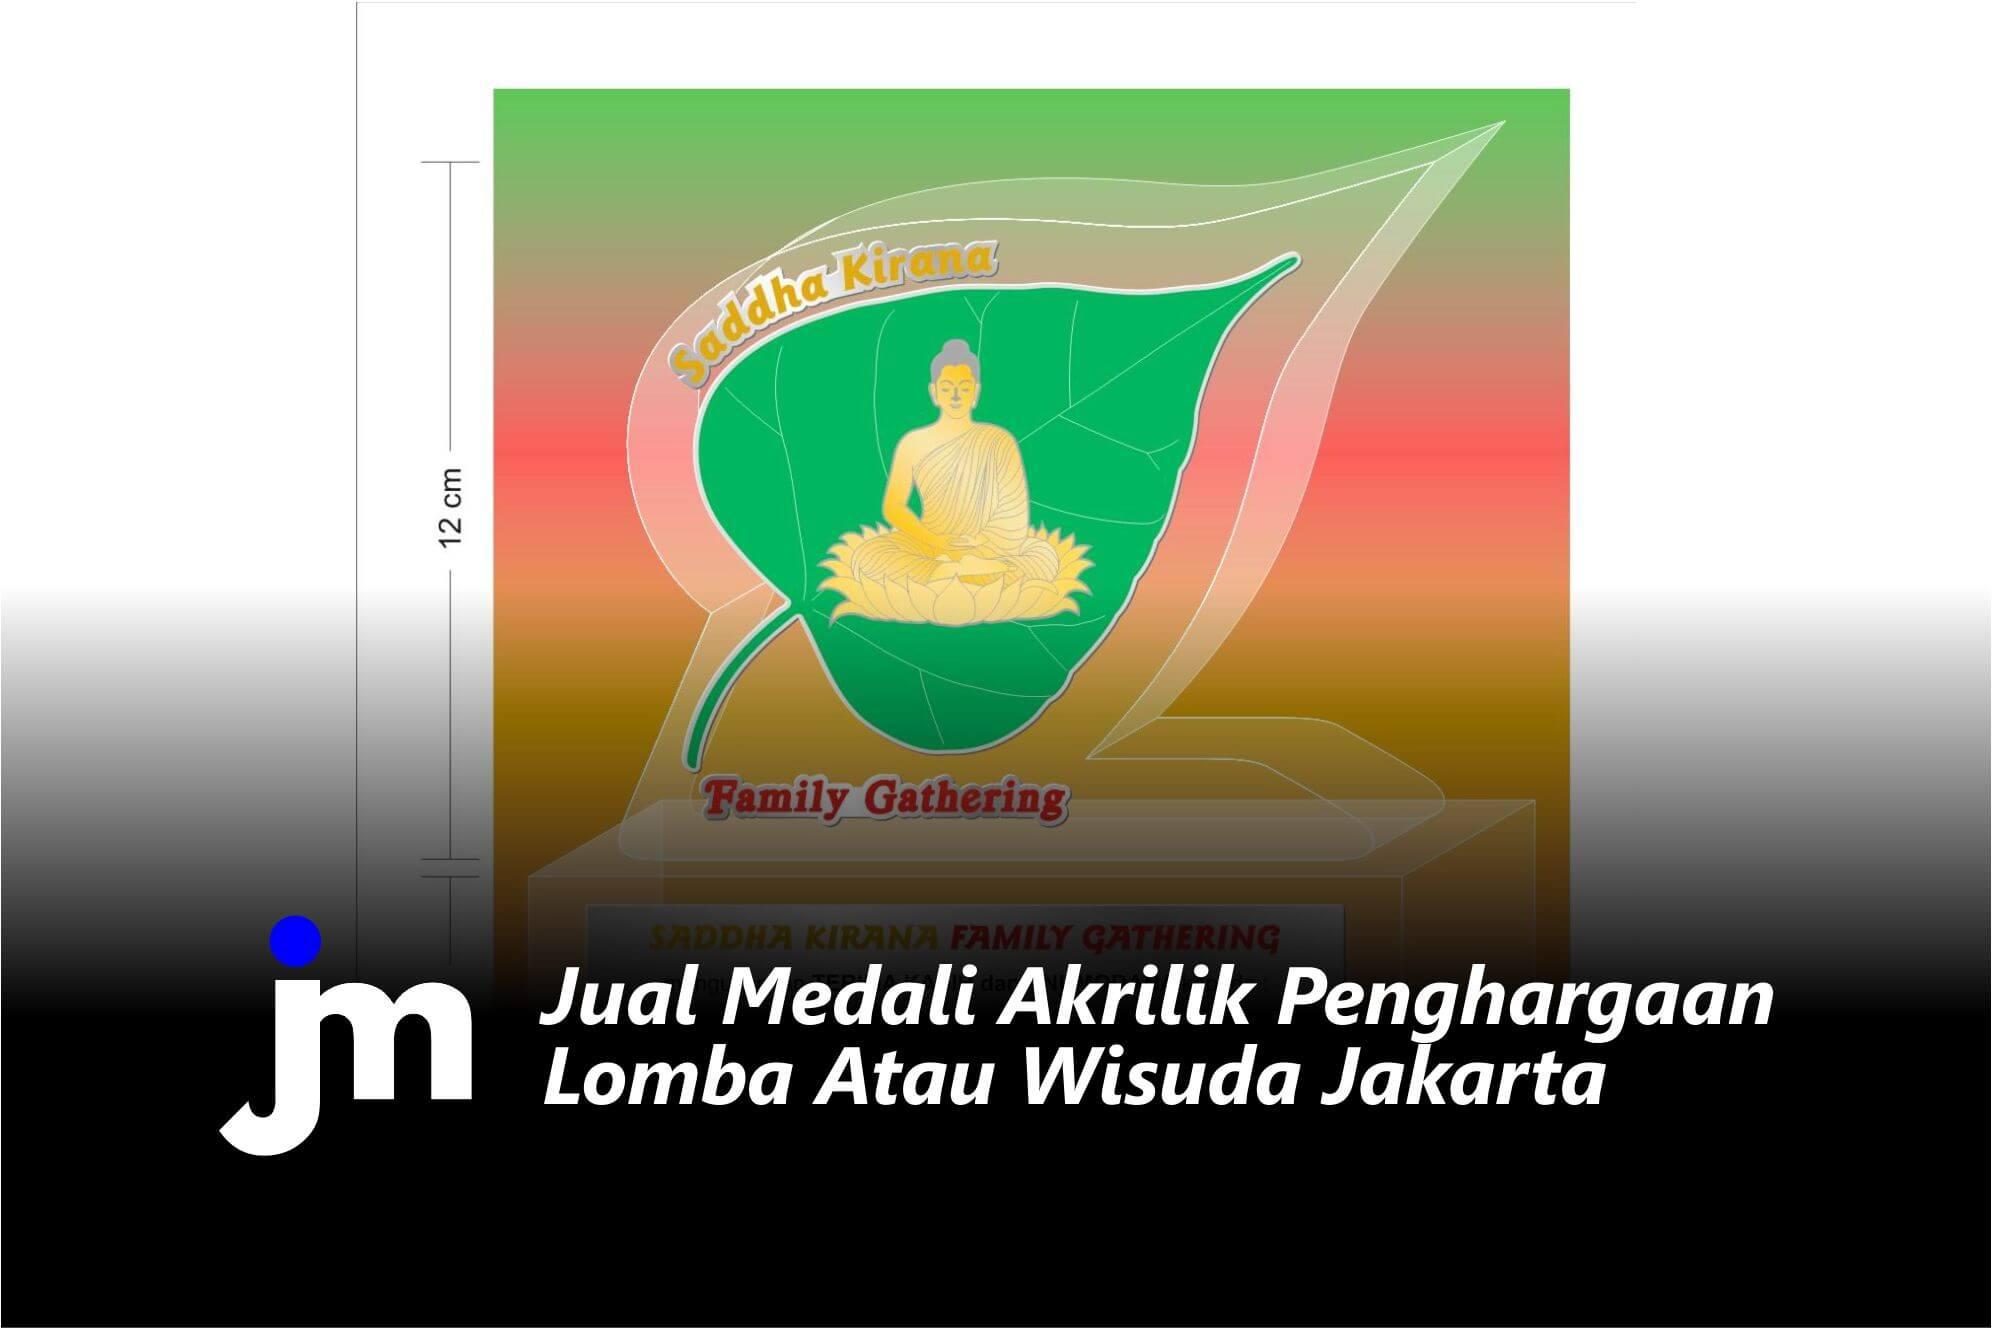 Jual Medali Akrilik Penghargaan Lomba Atau Wisuda Jakarta